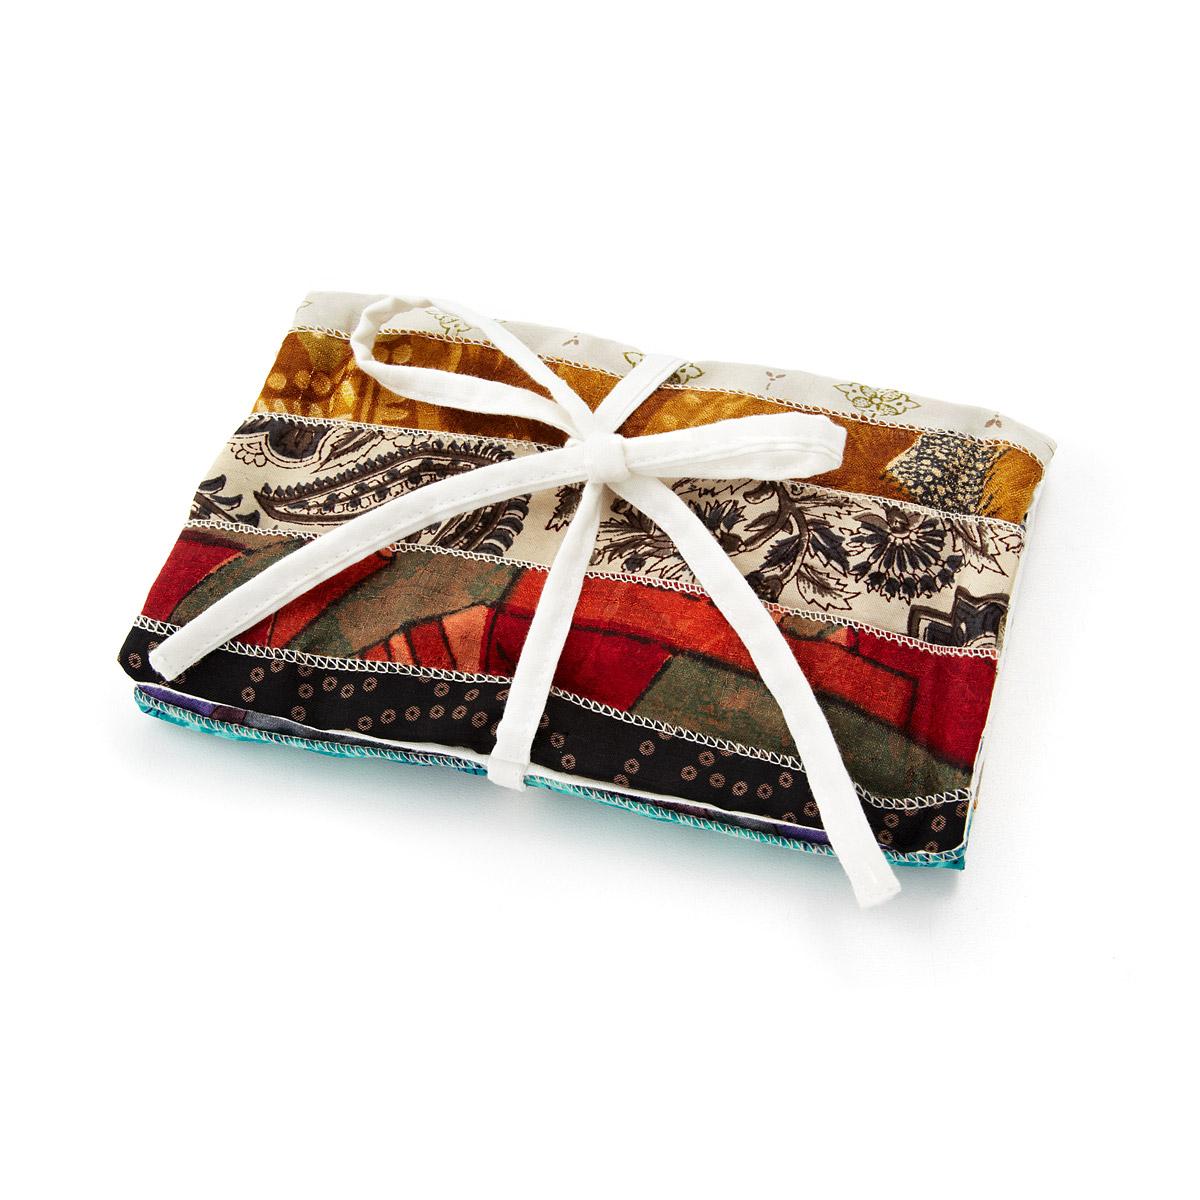 Upcycled Sari Jewelry Roll gift